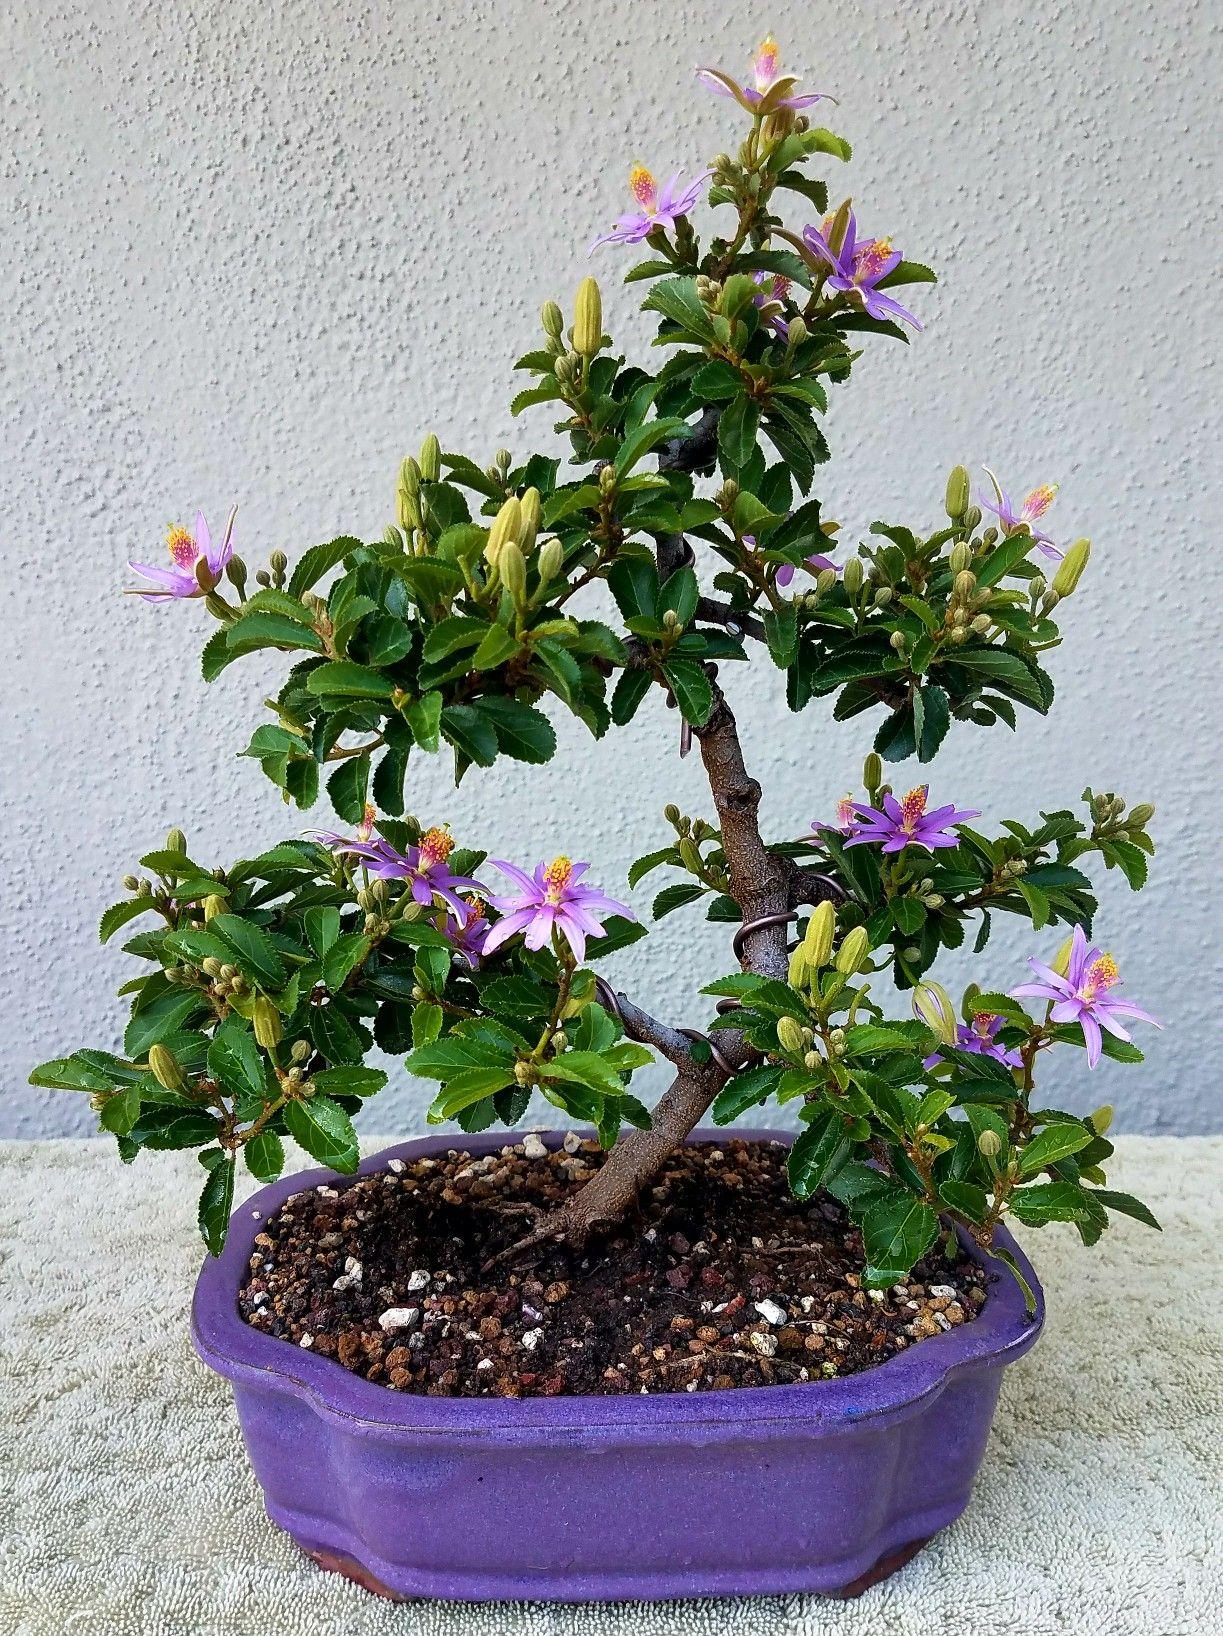 Picture 5 My Lavender Star Flower Pre Bonsai In Full Bloom 7 17 17 Pre Bonsai Star Flower Bonsai